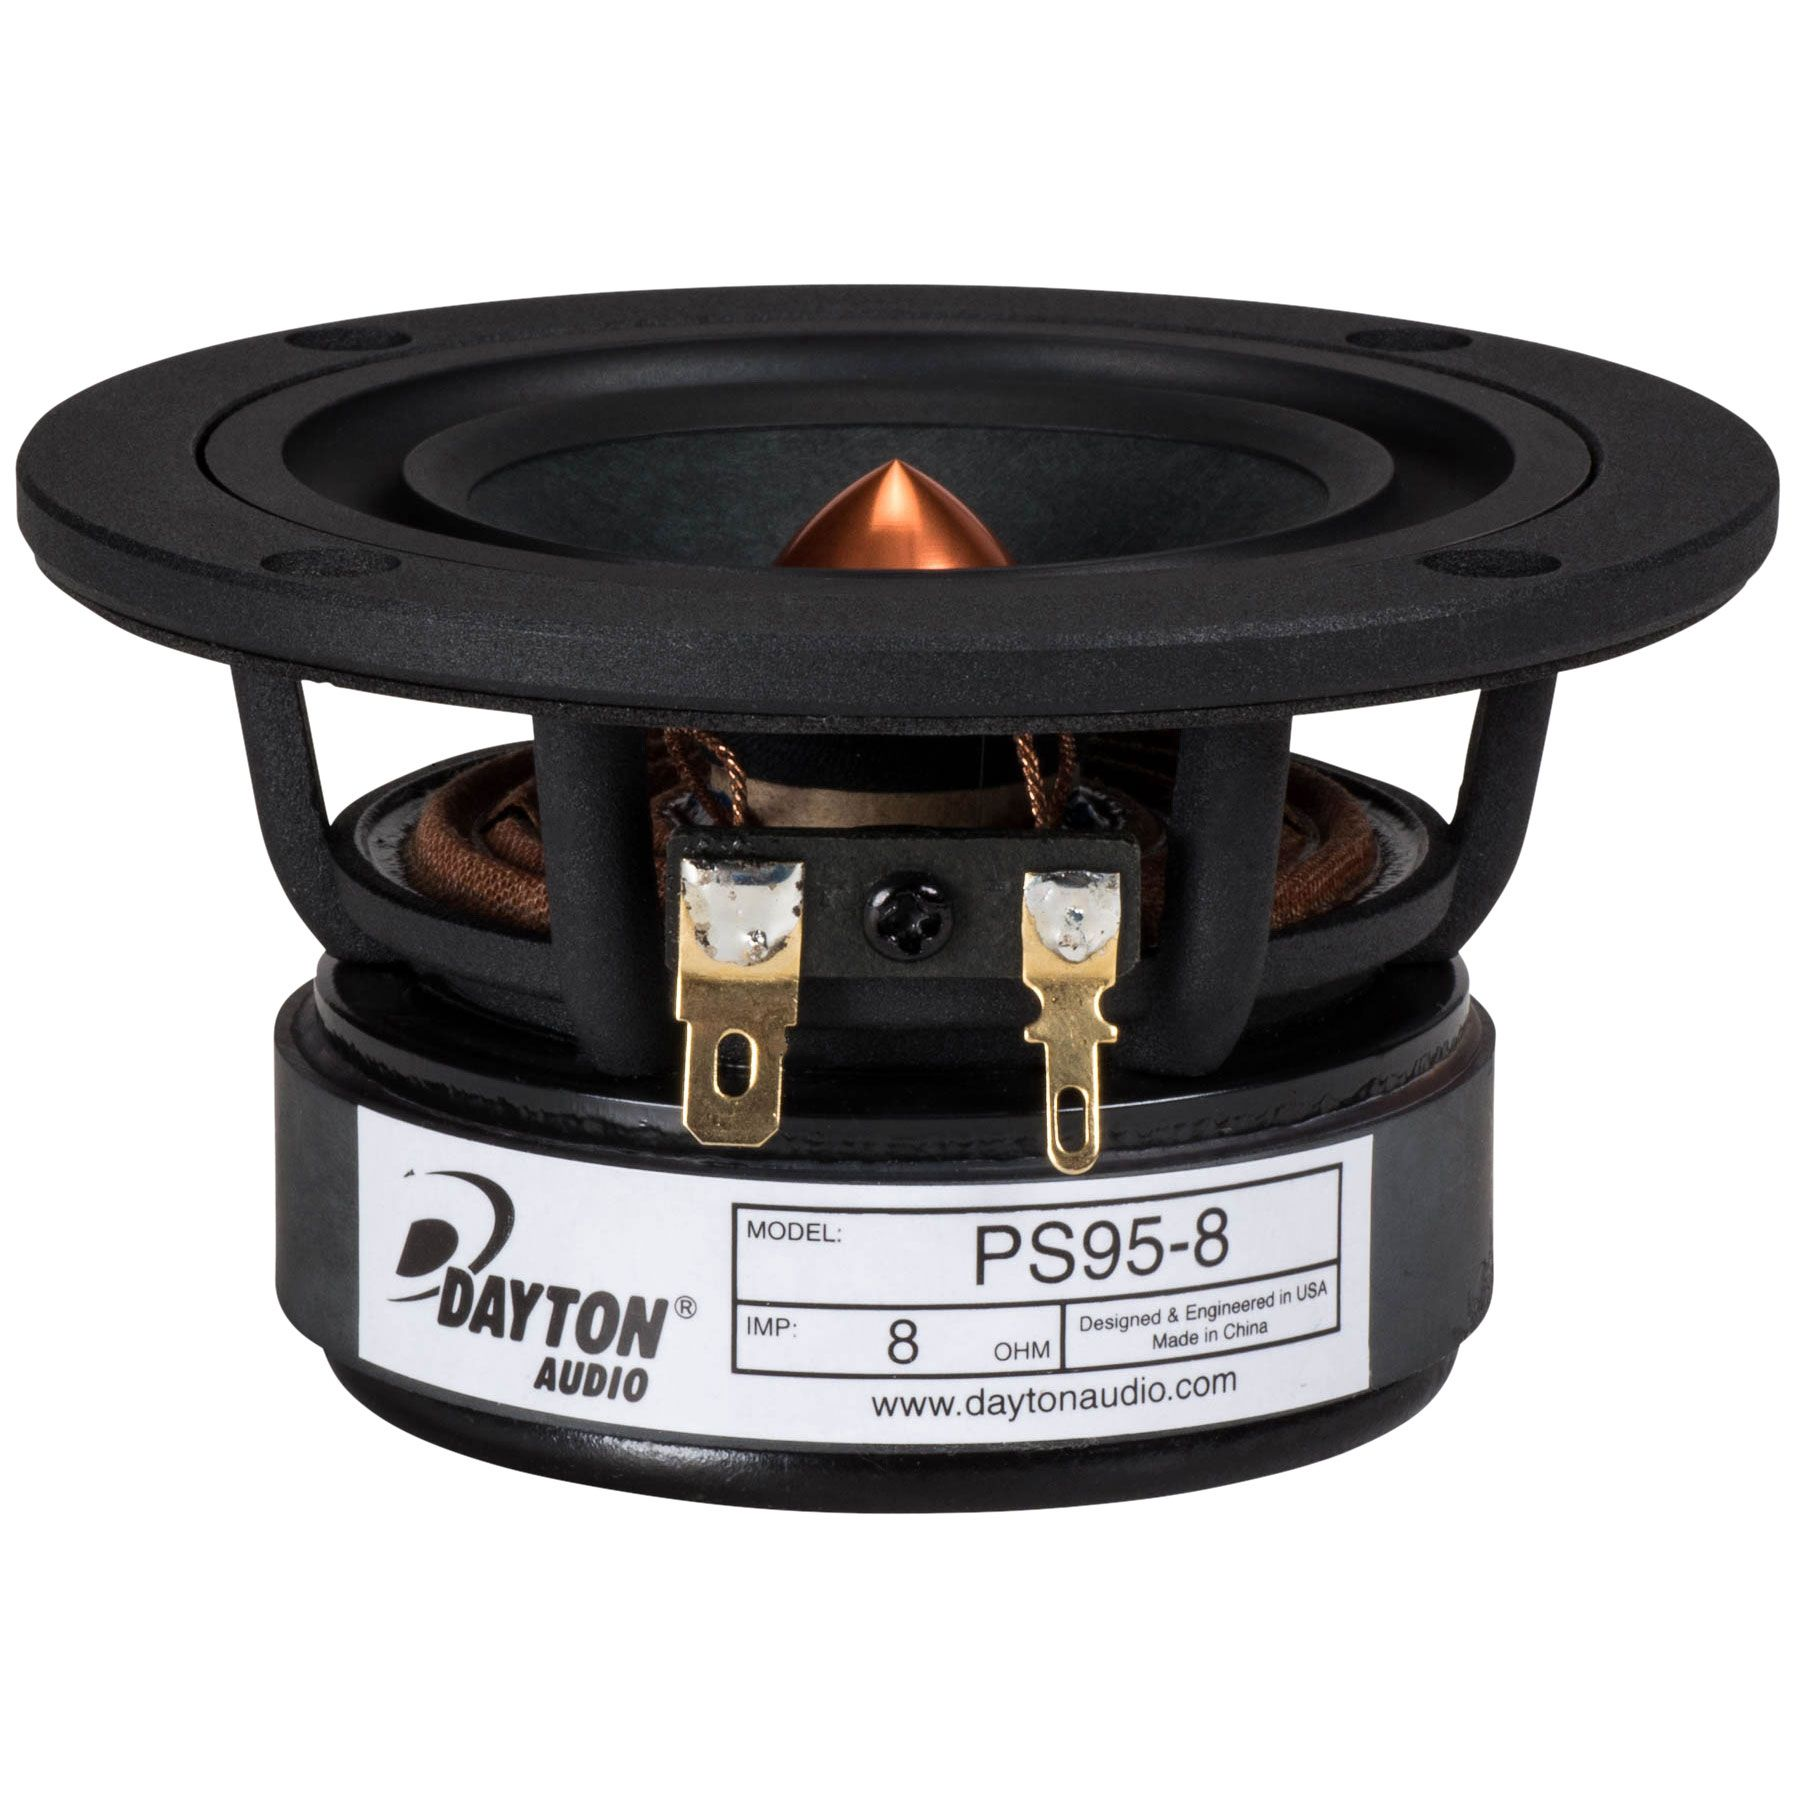 New full-range driver by Parts Express/Dayton Audio! Dayton Audio